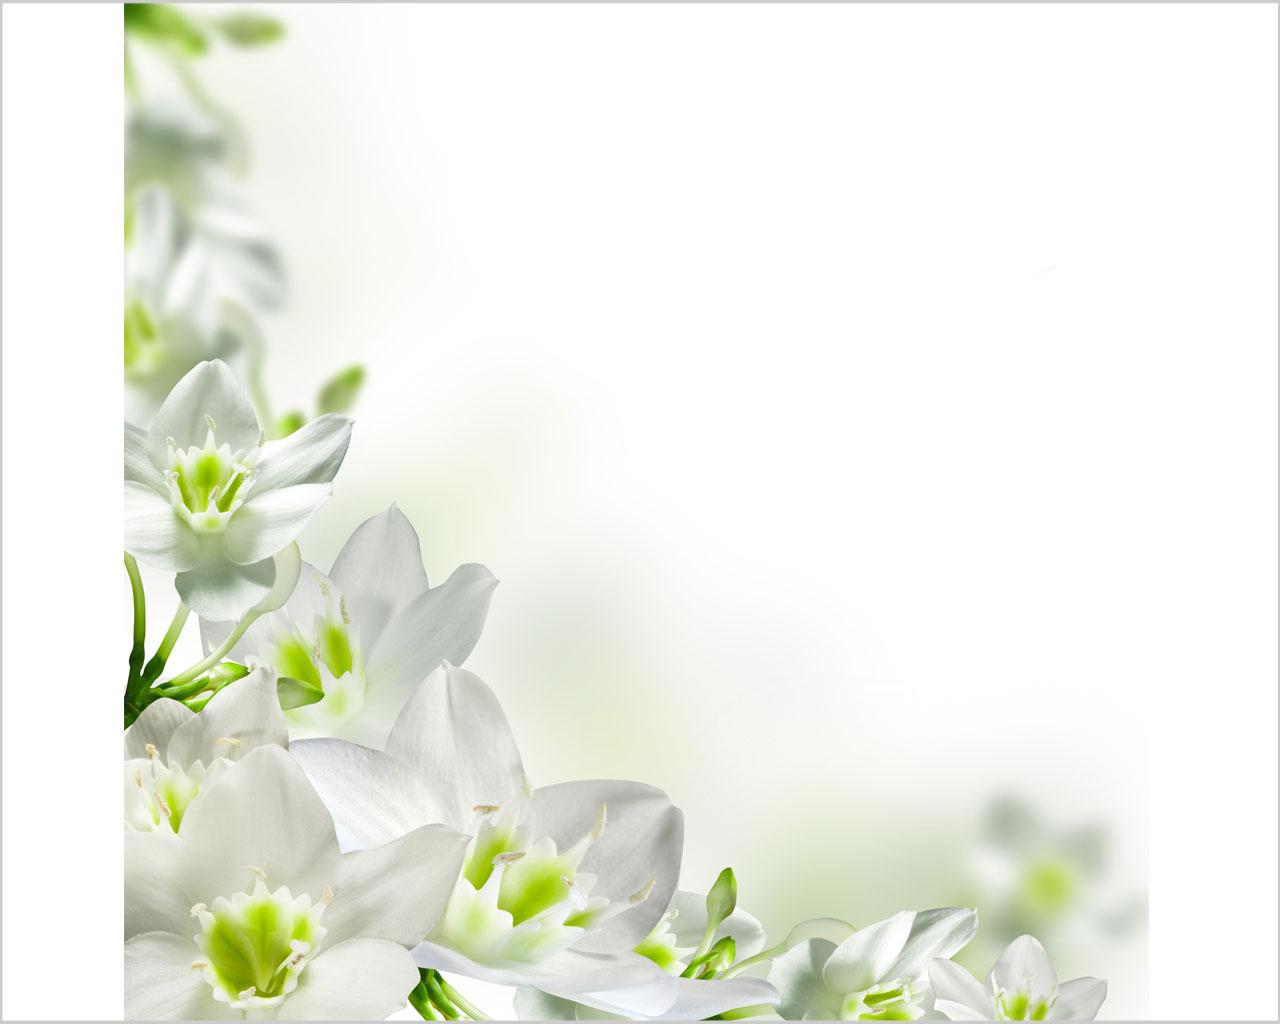 Candidi fiori bianchi fiori stampa su tela interni for Cornici bianche